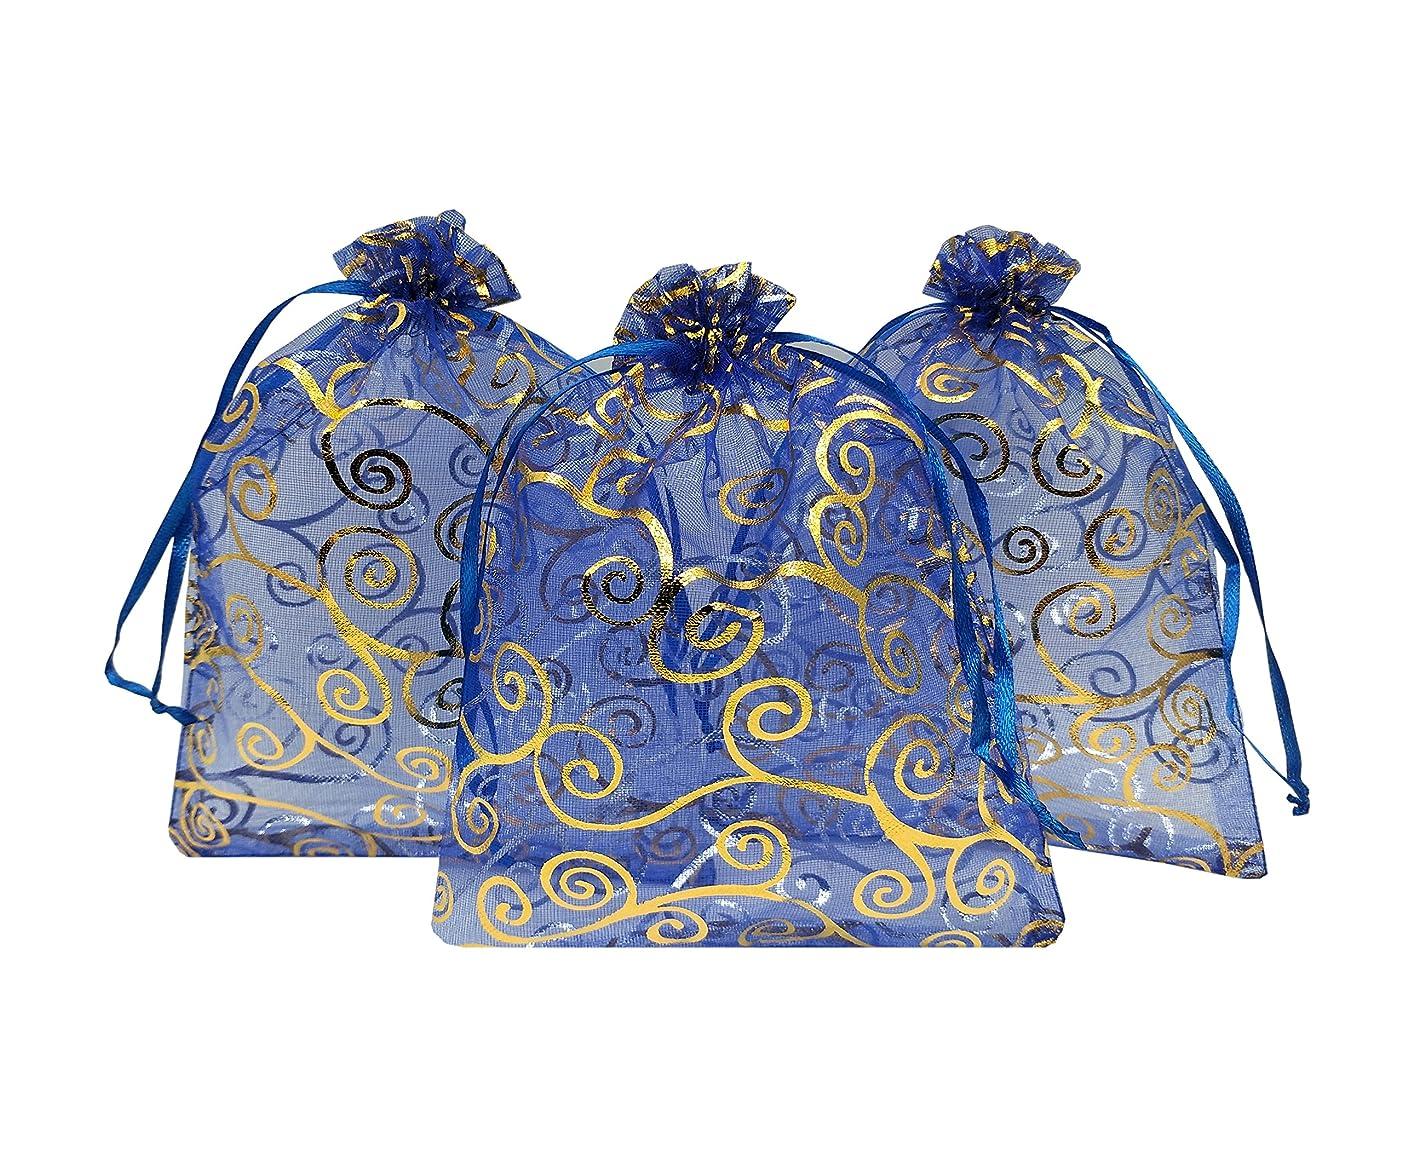 Ankirol 100pcs Sheer Organza Favor Bags 5x7'' For Wedding Bags Samples Display Drawstring Pouches (blue-gold swirl)